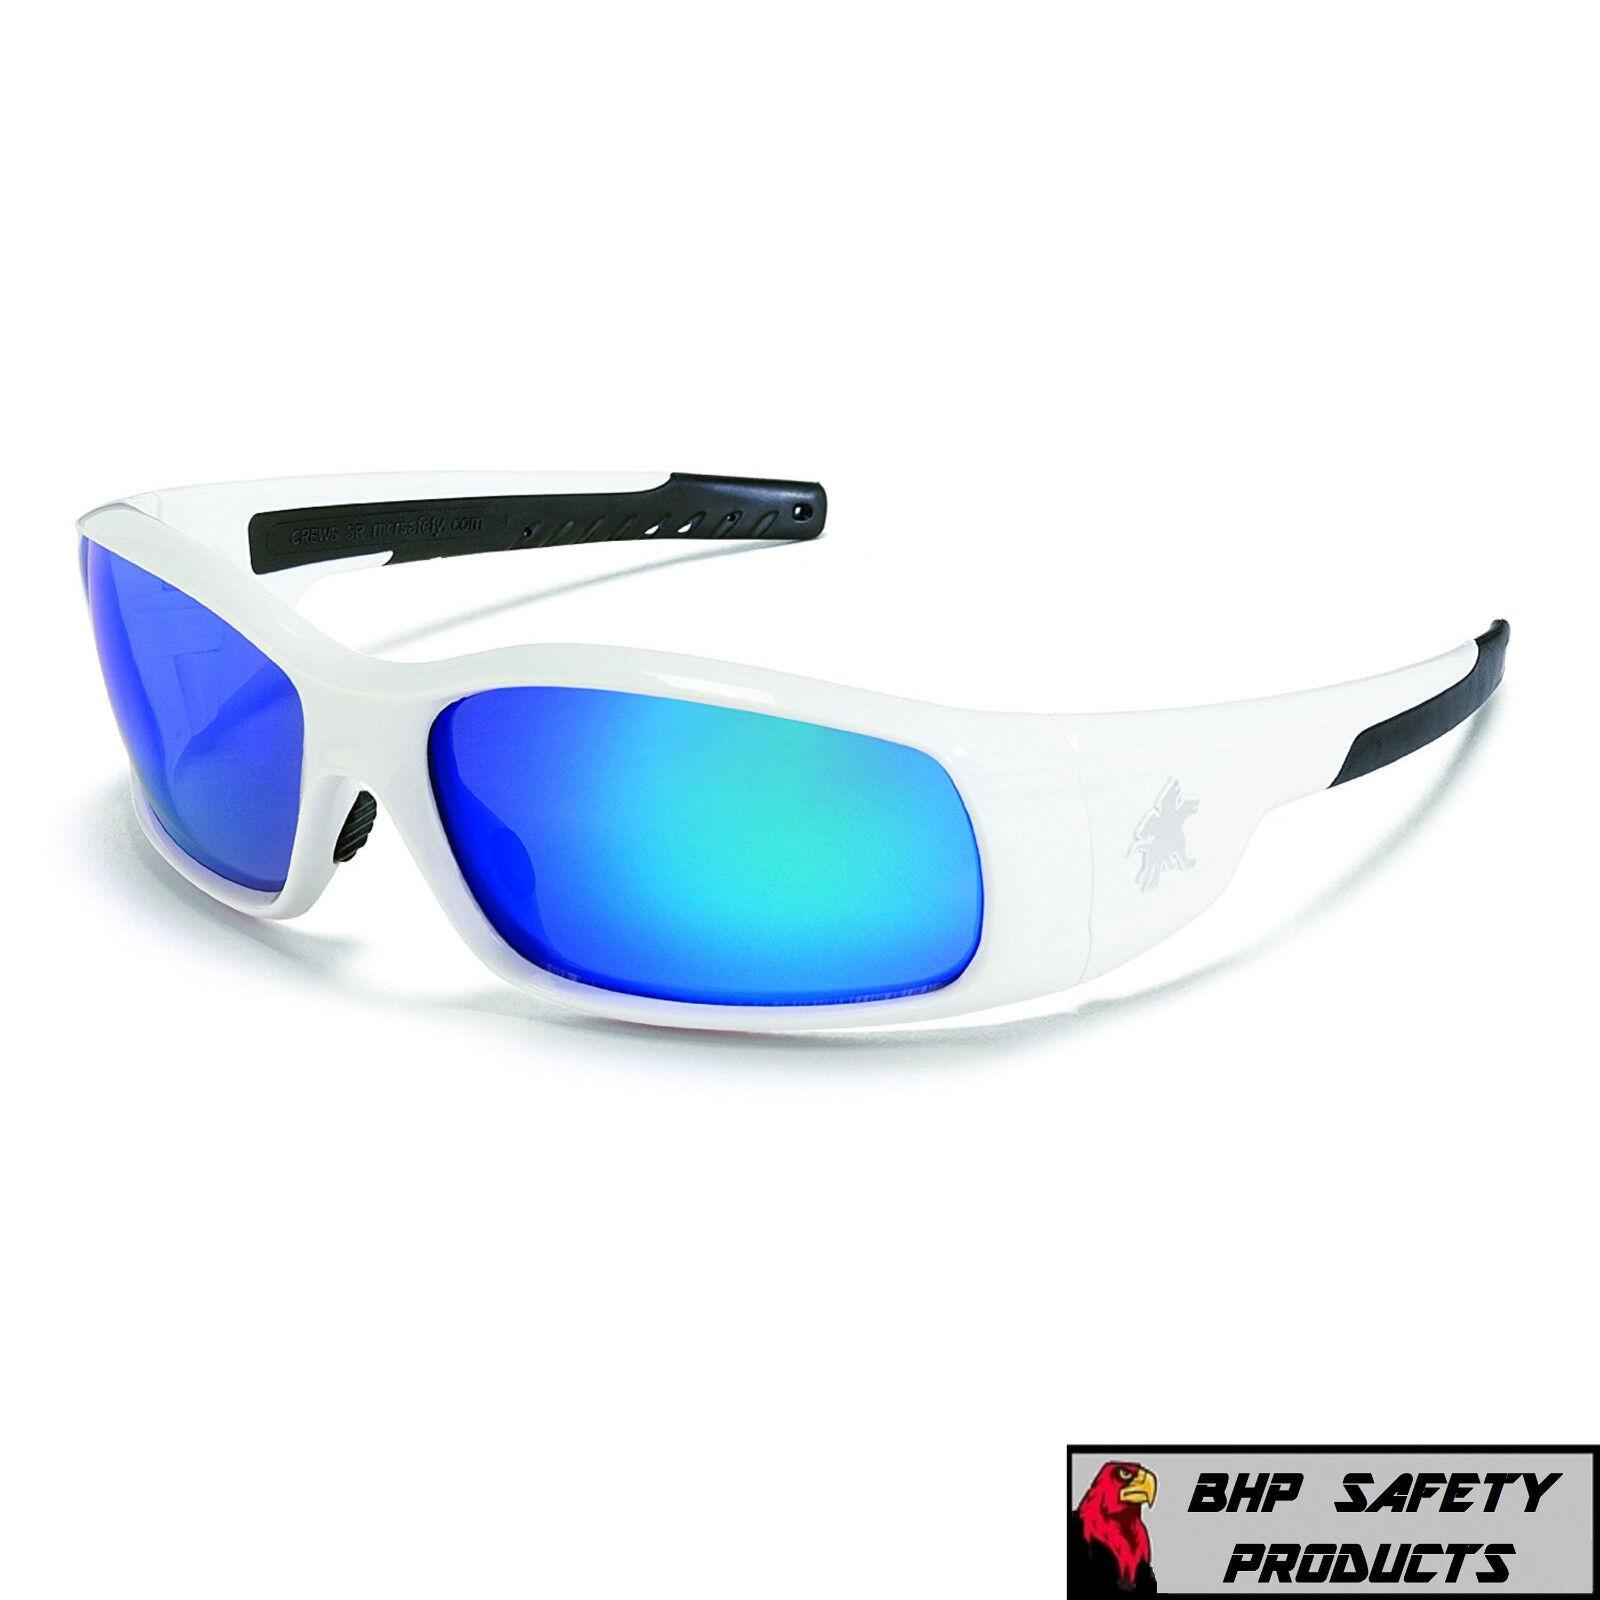 MCR CREWS SWAGGER SAFETY GLASSES SUNGLASSES WORK SPORT EYEWEAR CHOOSE YOUR COLOR SR128B BLUE MIRROR/WHITE FRAME